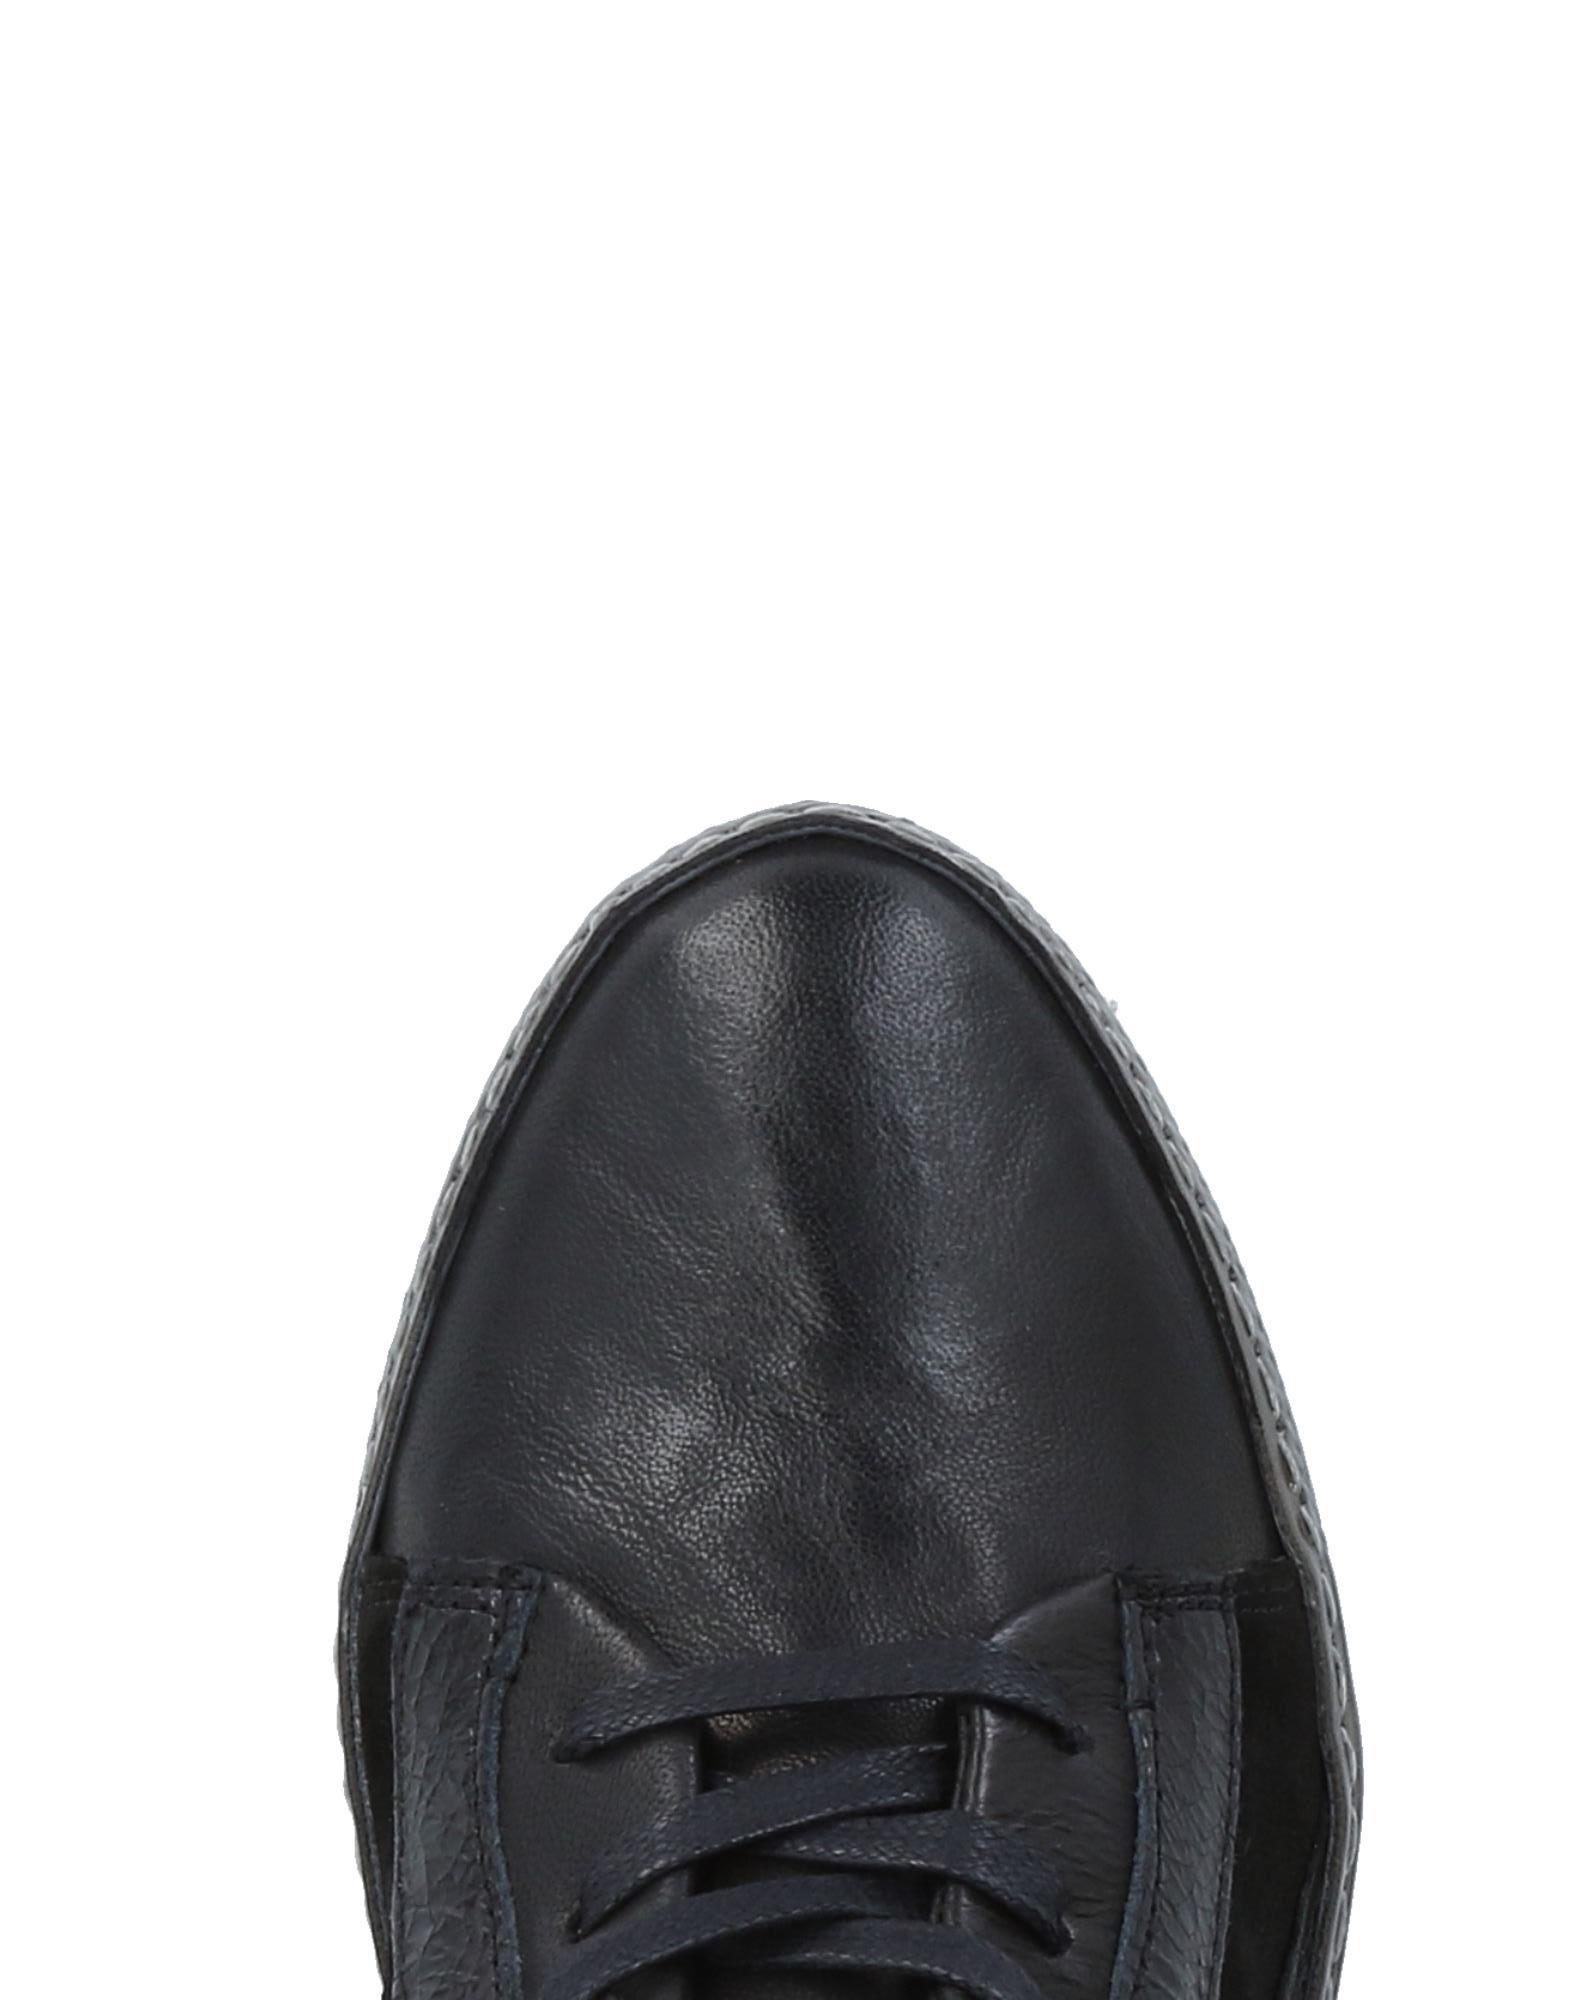 Khrio' Sneakers Damen  11492137FO Gute Qualität beliebte Schuhe